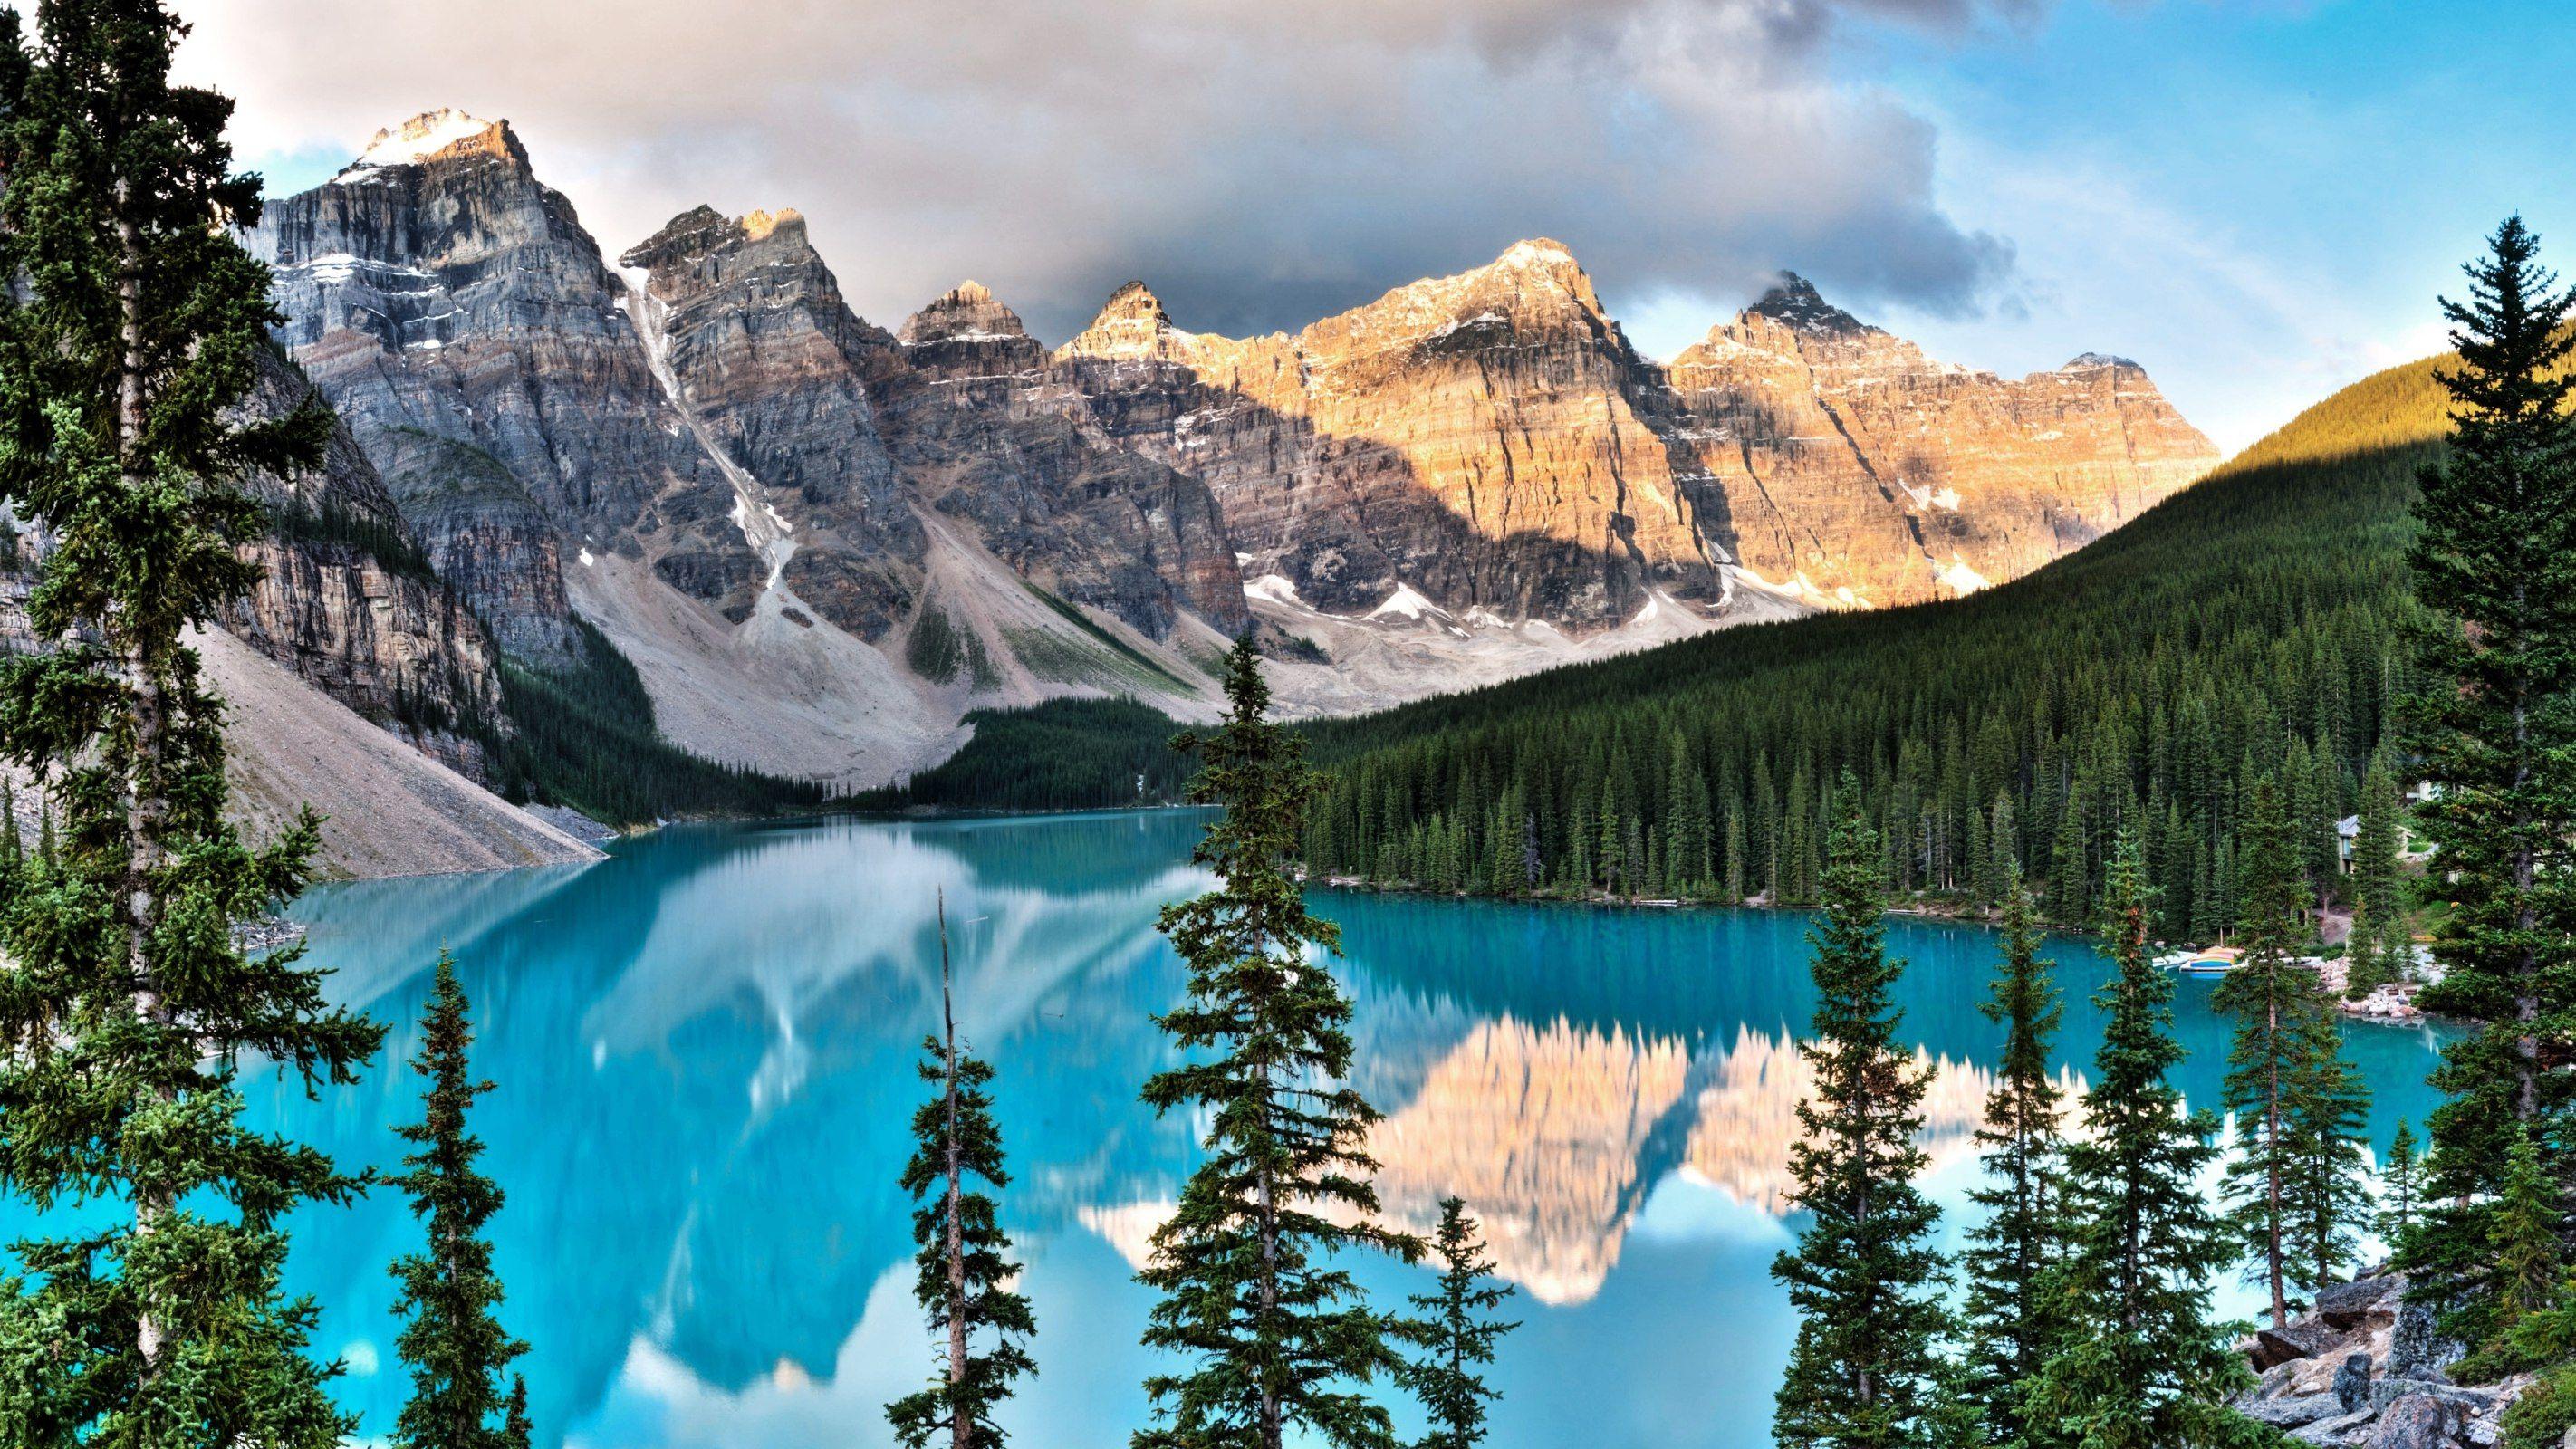 Beautiful mountain and lake scene wallpaper 2844x1600